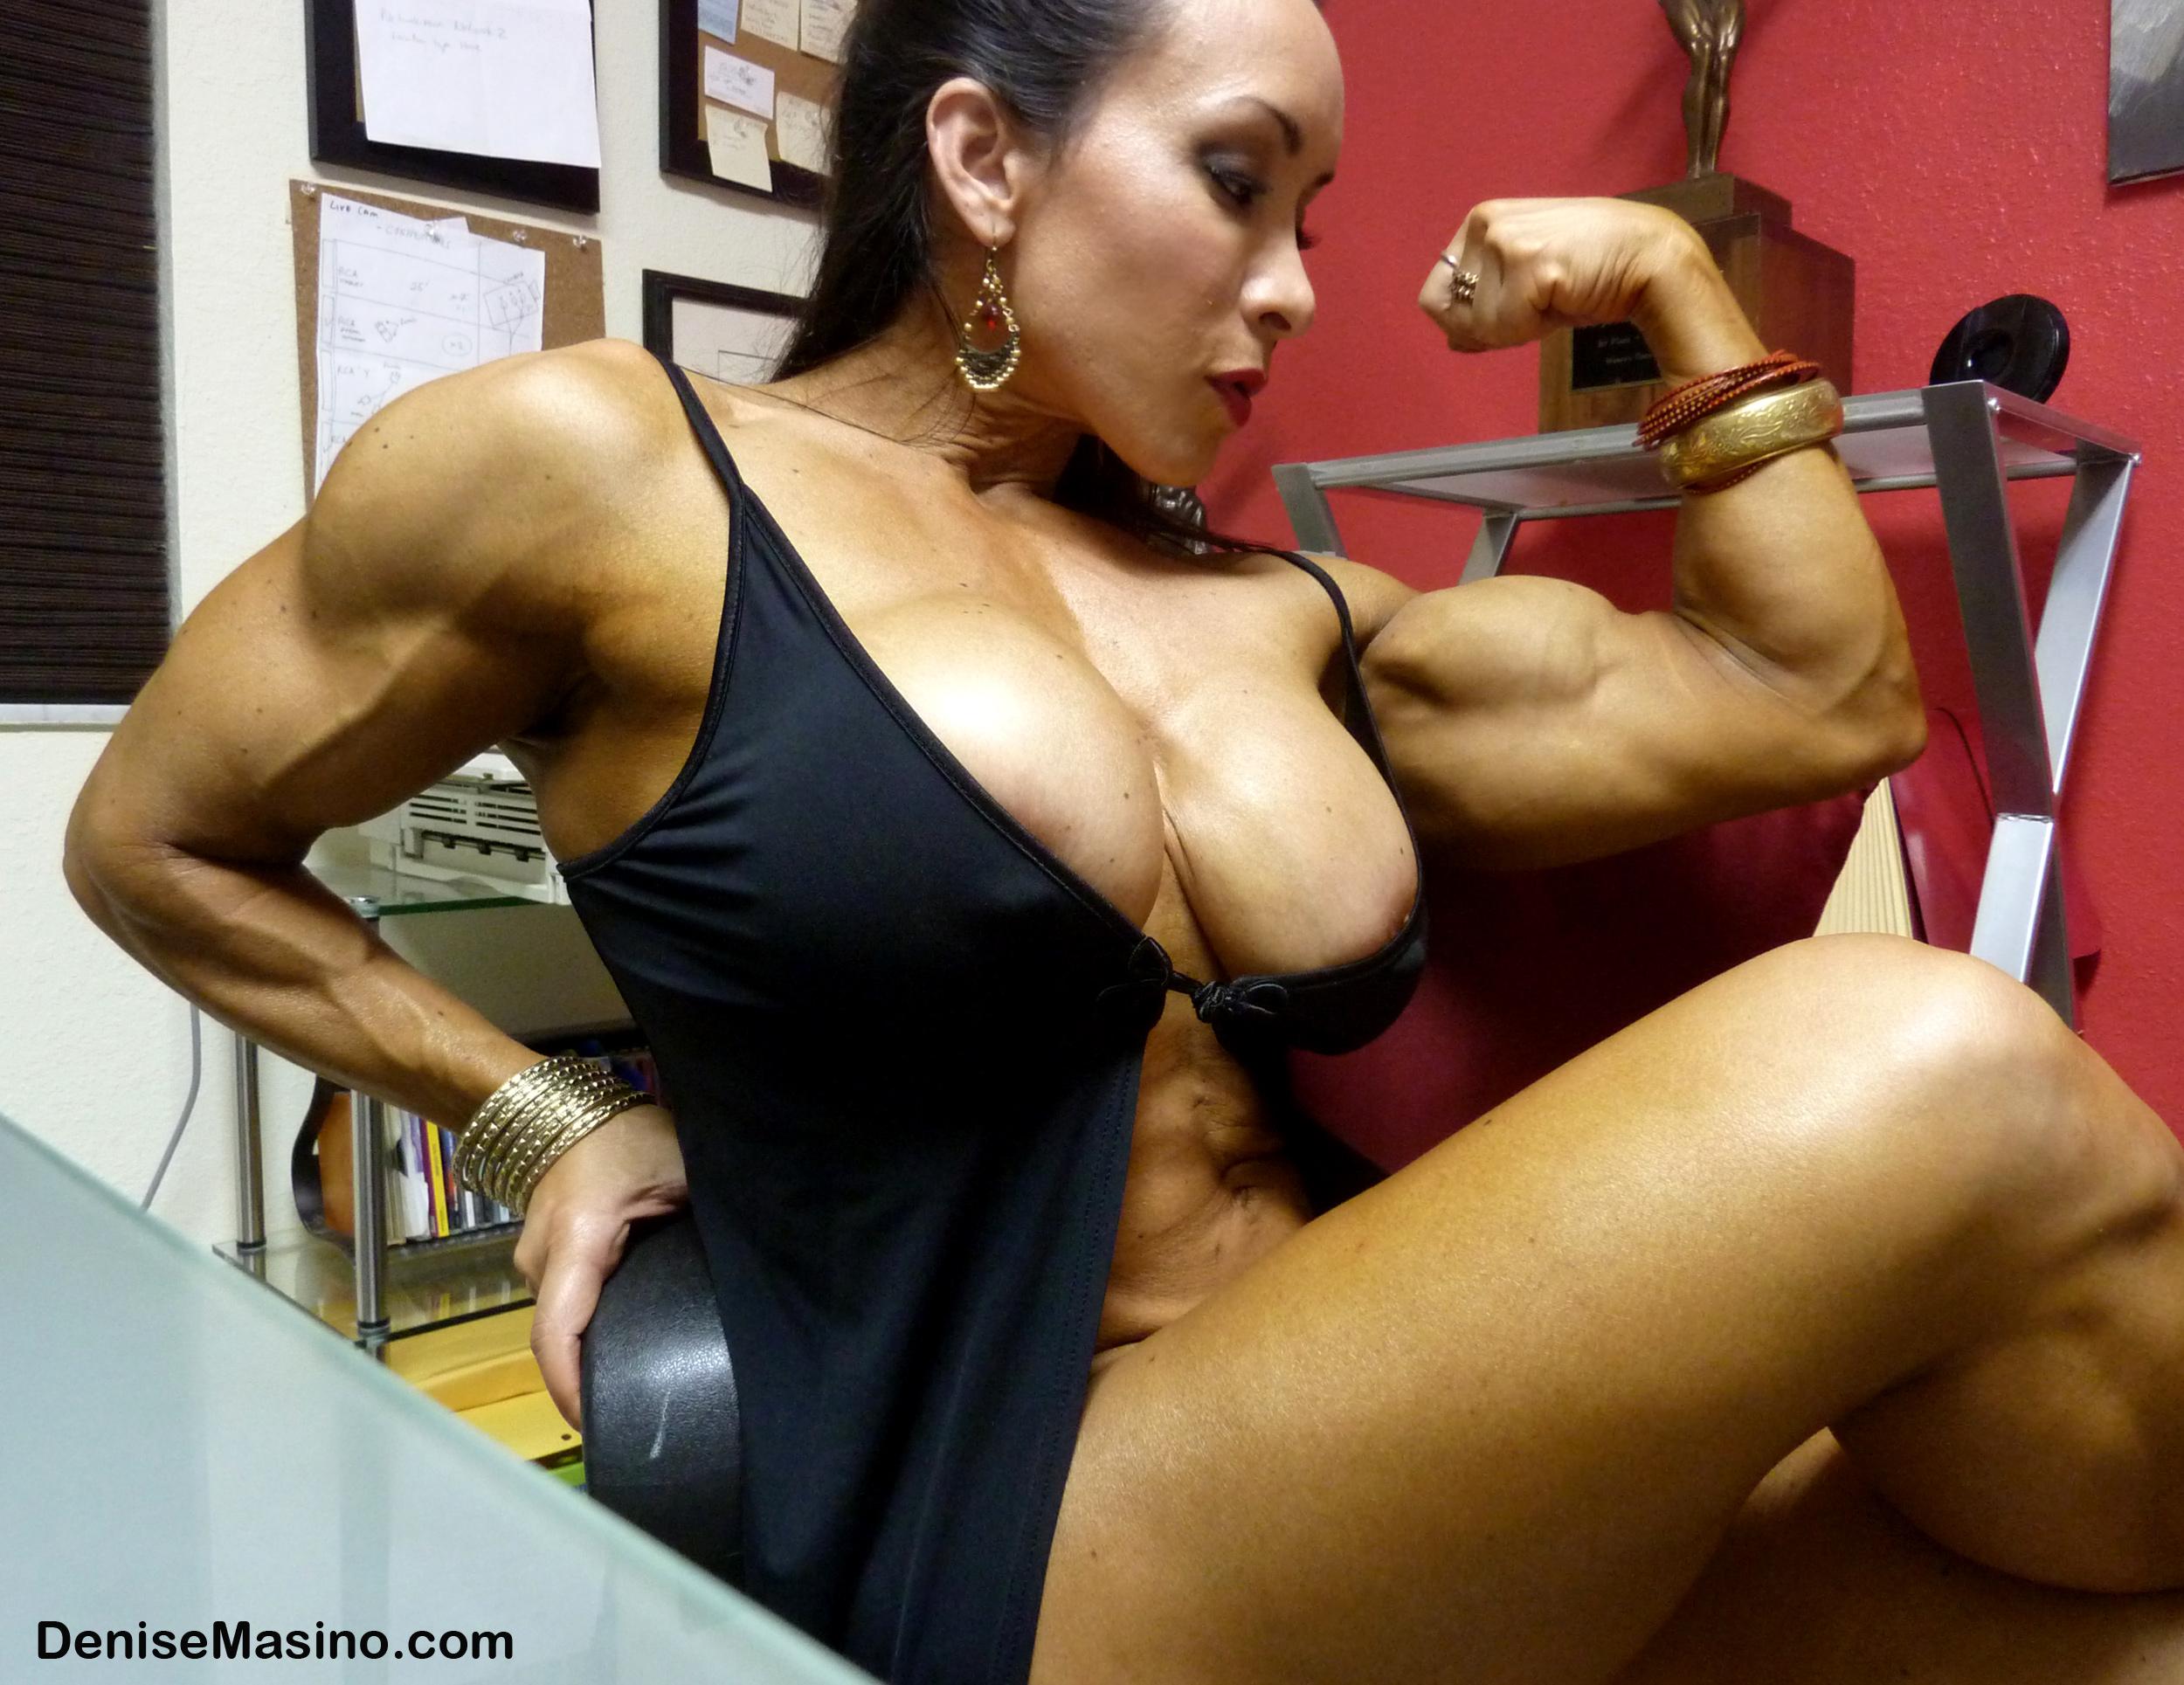 Denise Masino Office Mistress339